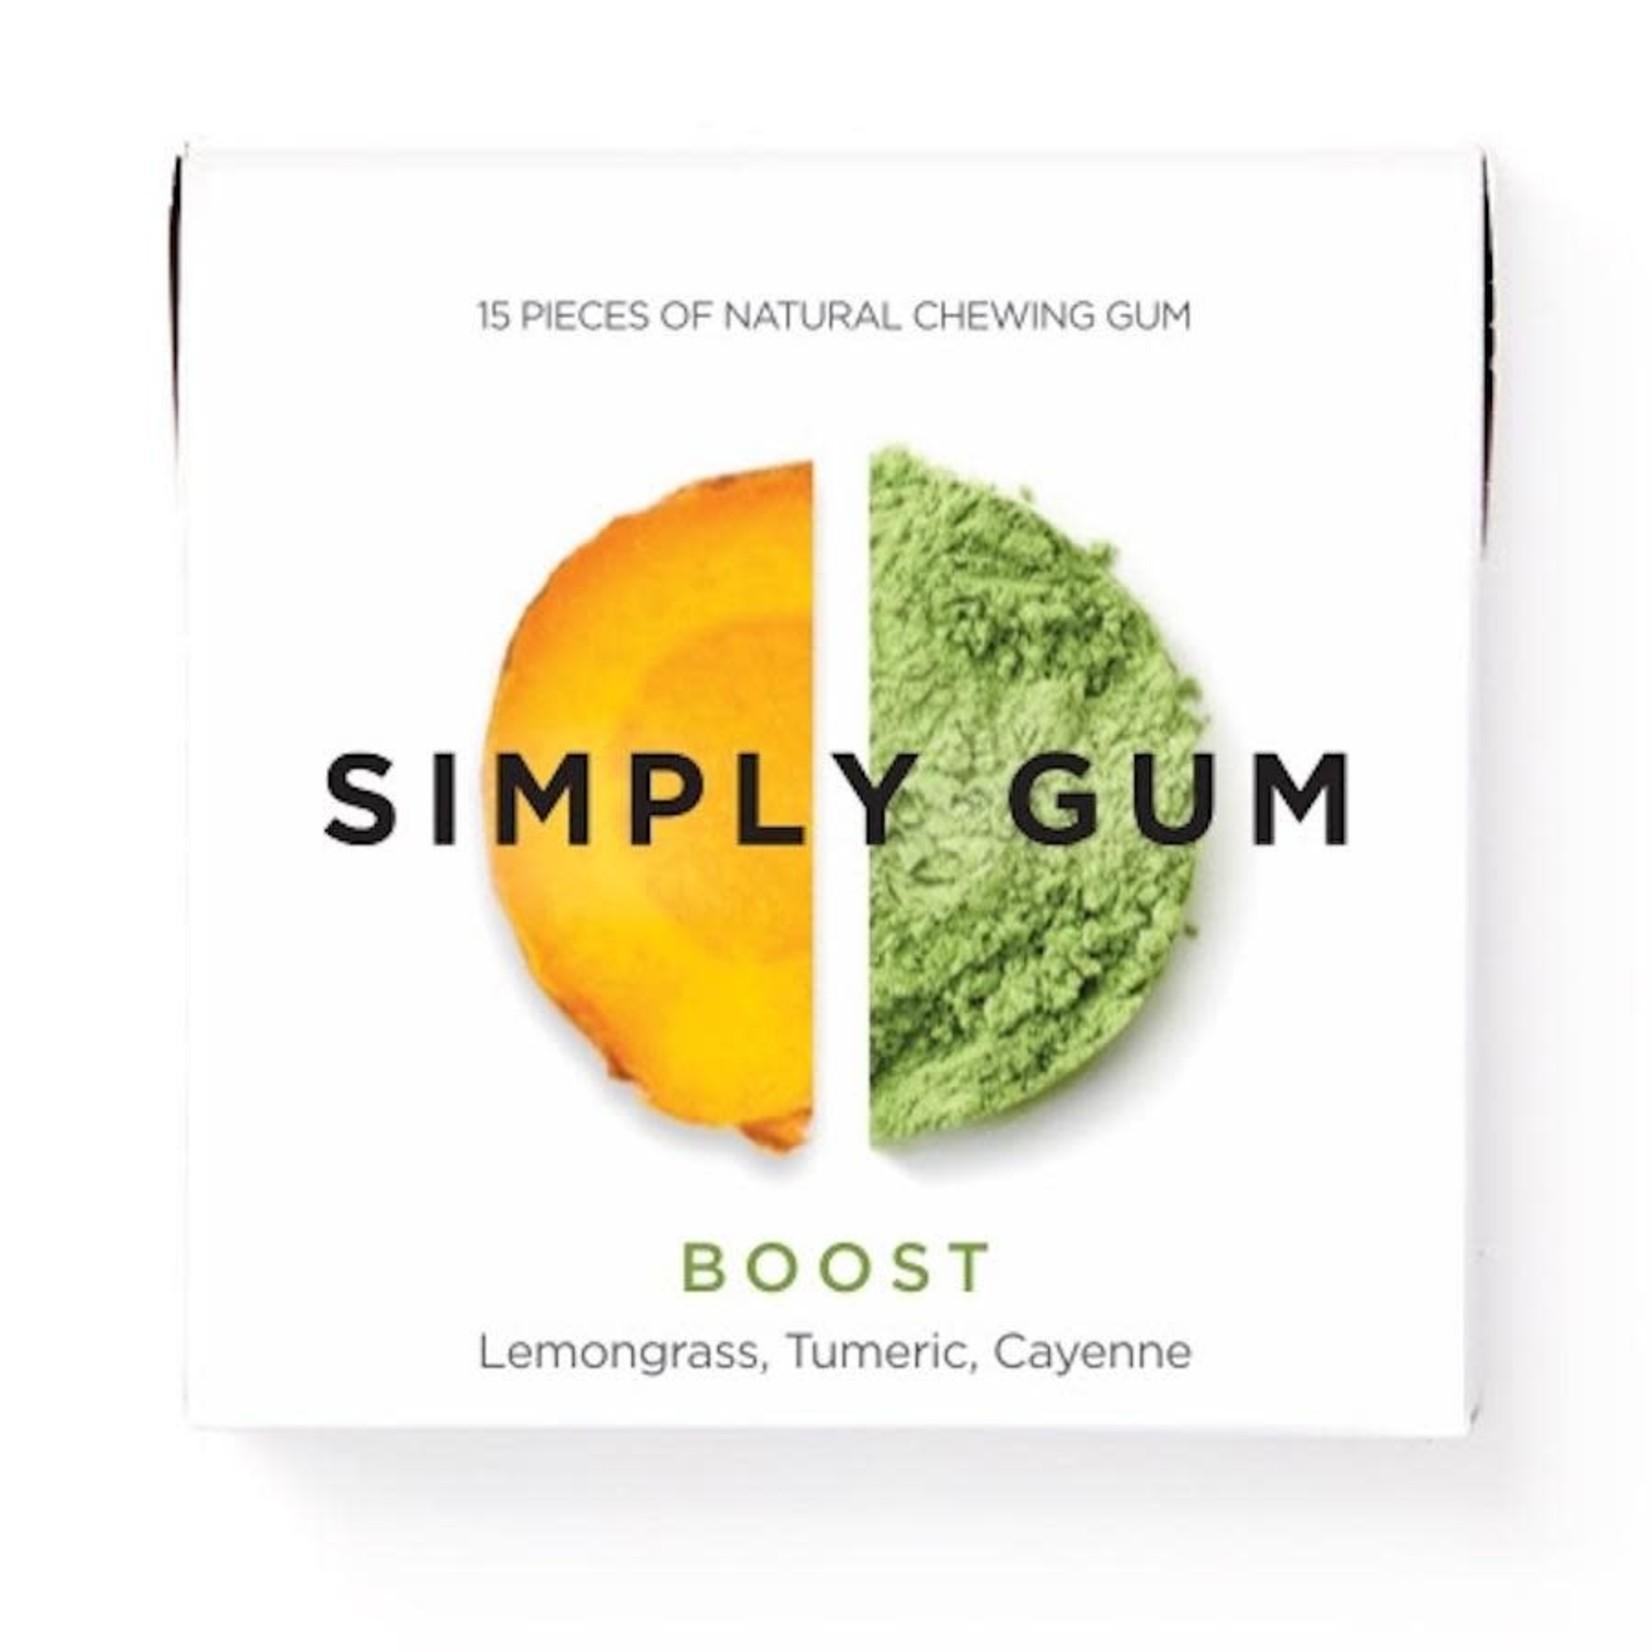 SIMPLY GUM BOOST GUM